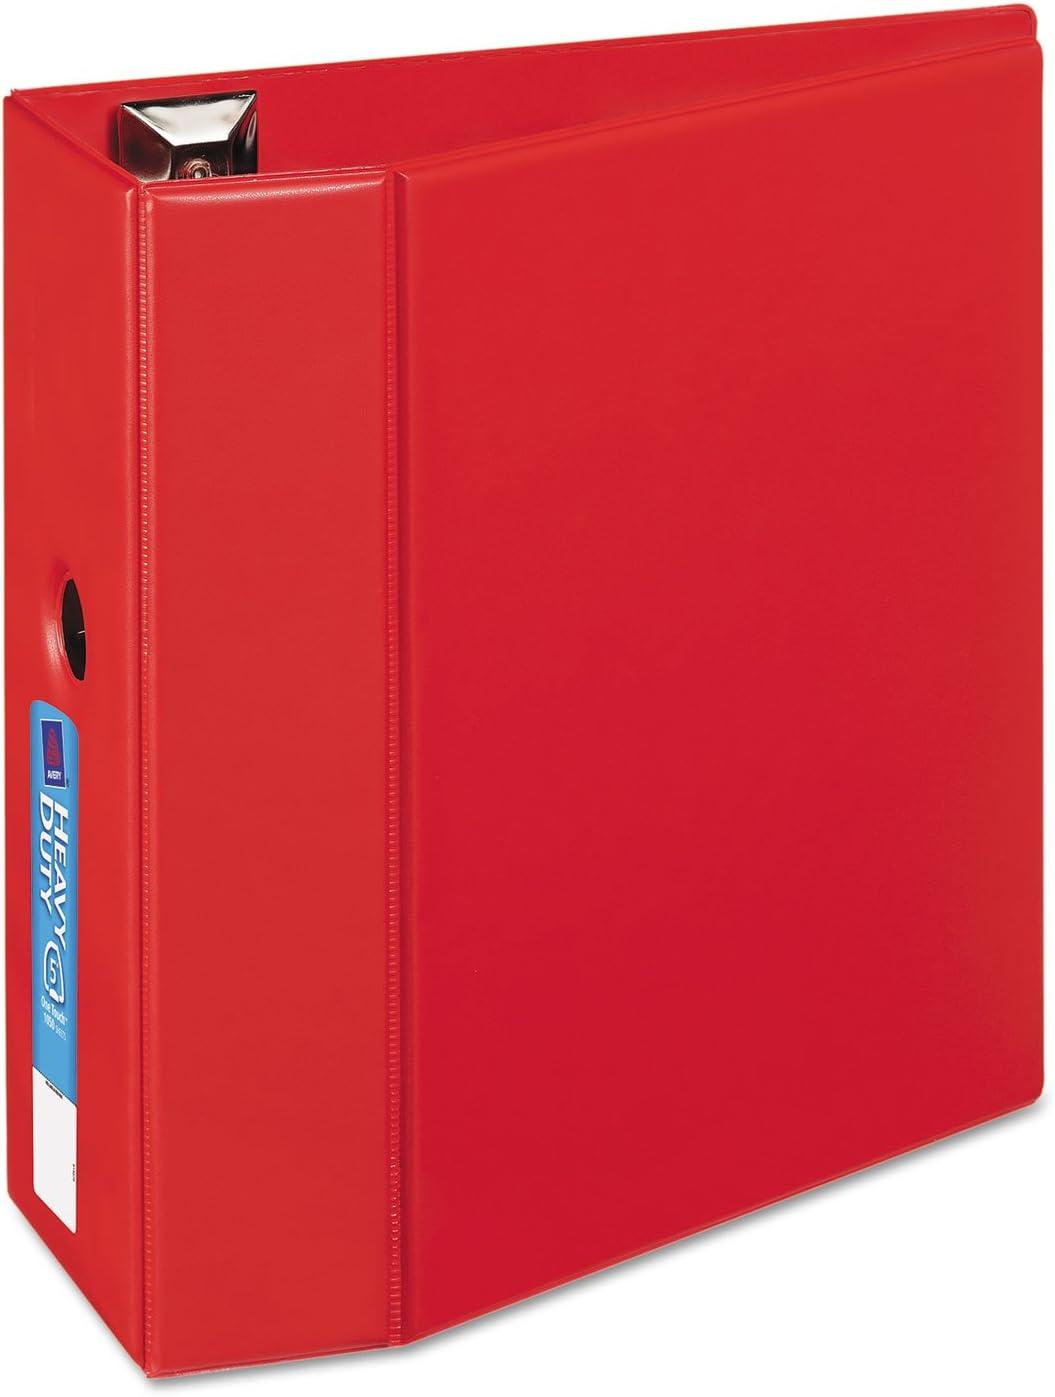 Avery 79586 3-Ring EZD Binder 8-1//2-Inch x11-Inch Red 5-Inch Capacity